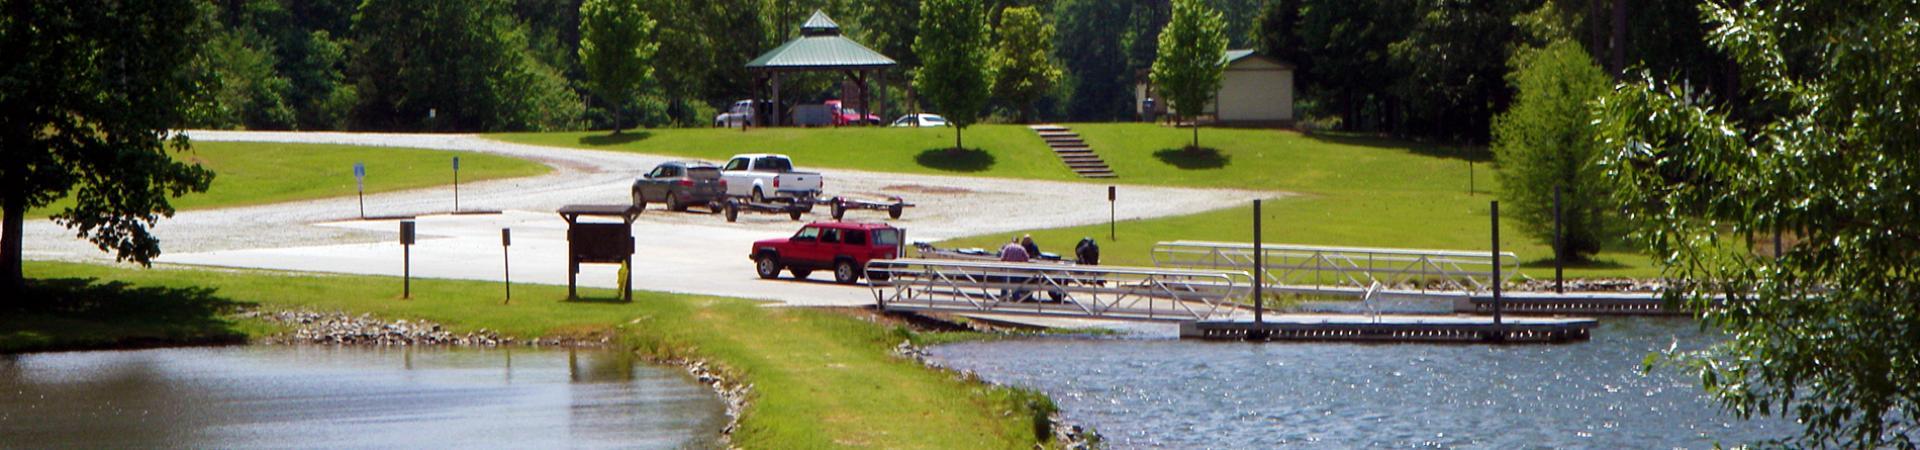 Boat Ramp at Big Lazer Creek